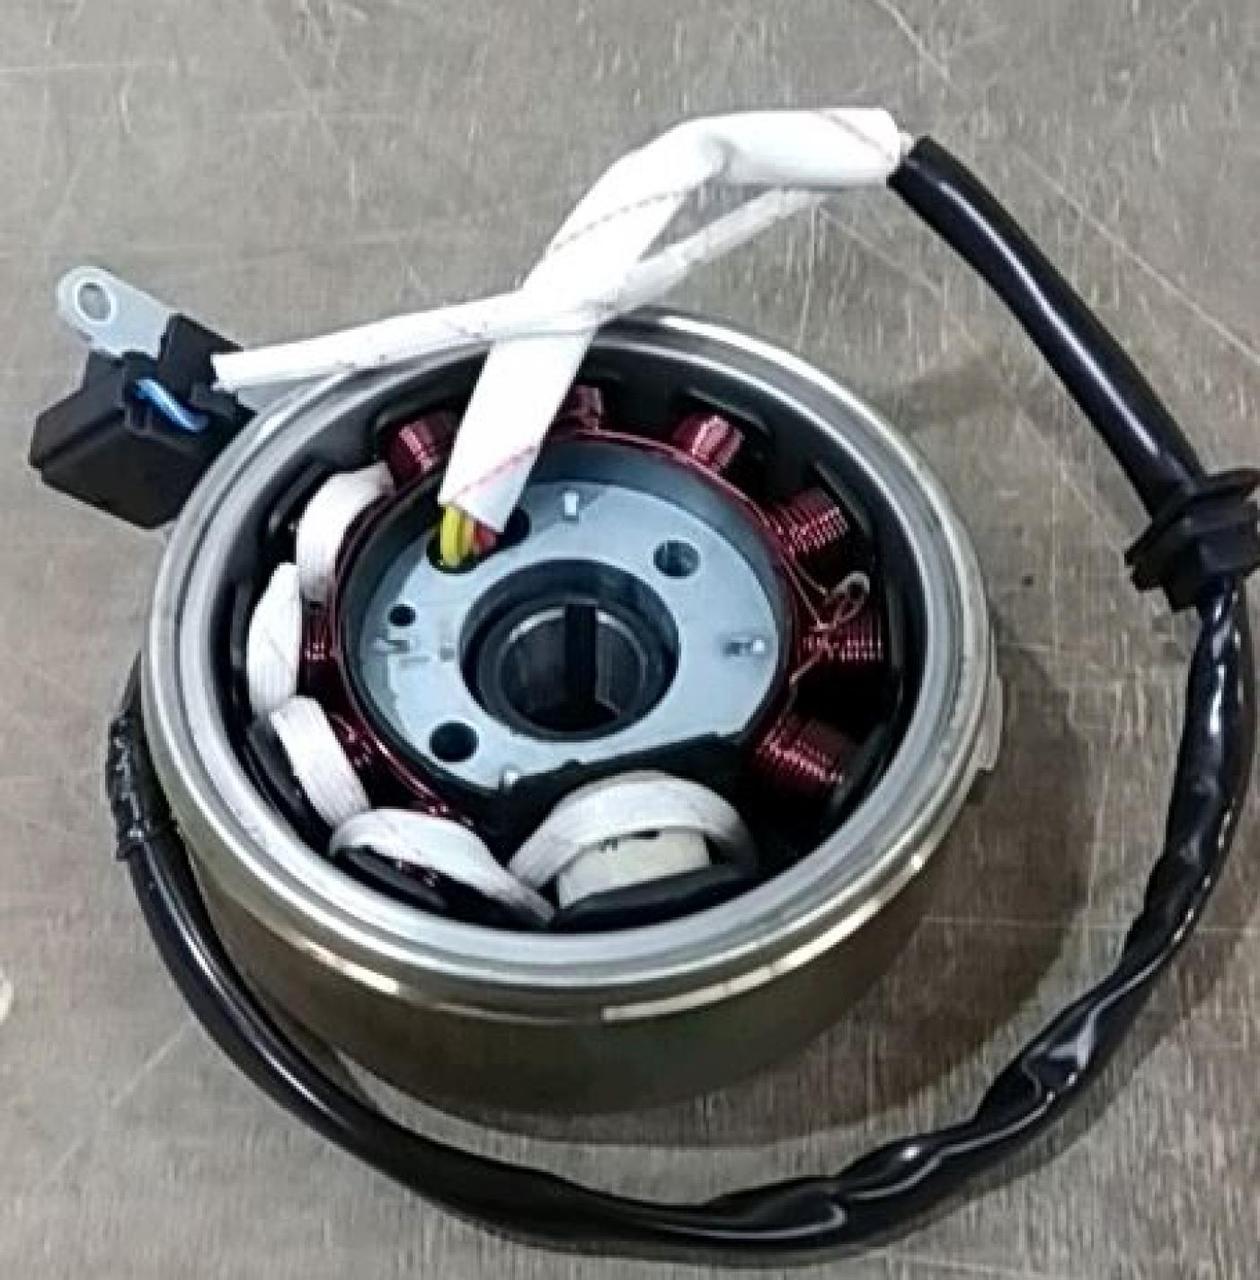 Генератор на Китайский Скутер 4Т 4-х тактный (Gy6) 125/150 (10+1 катушка) PLT